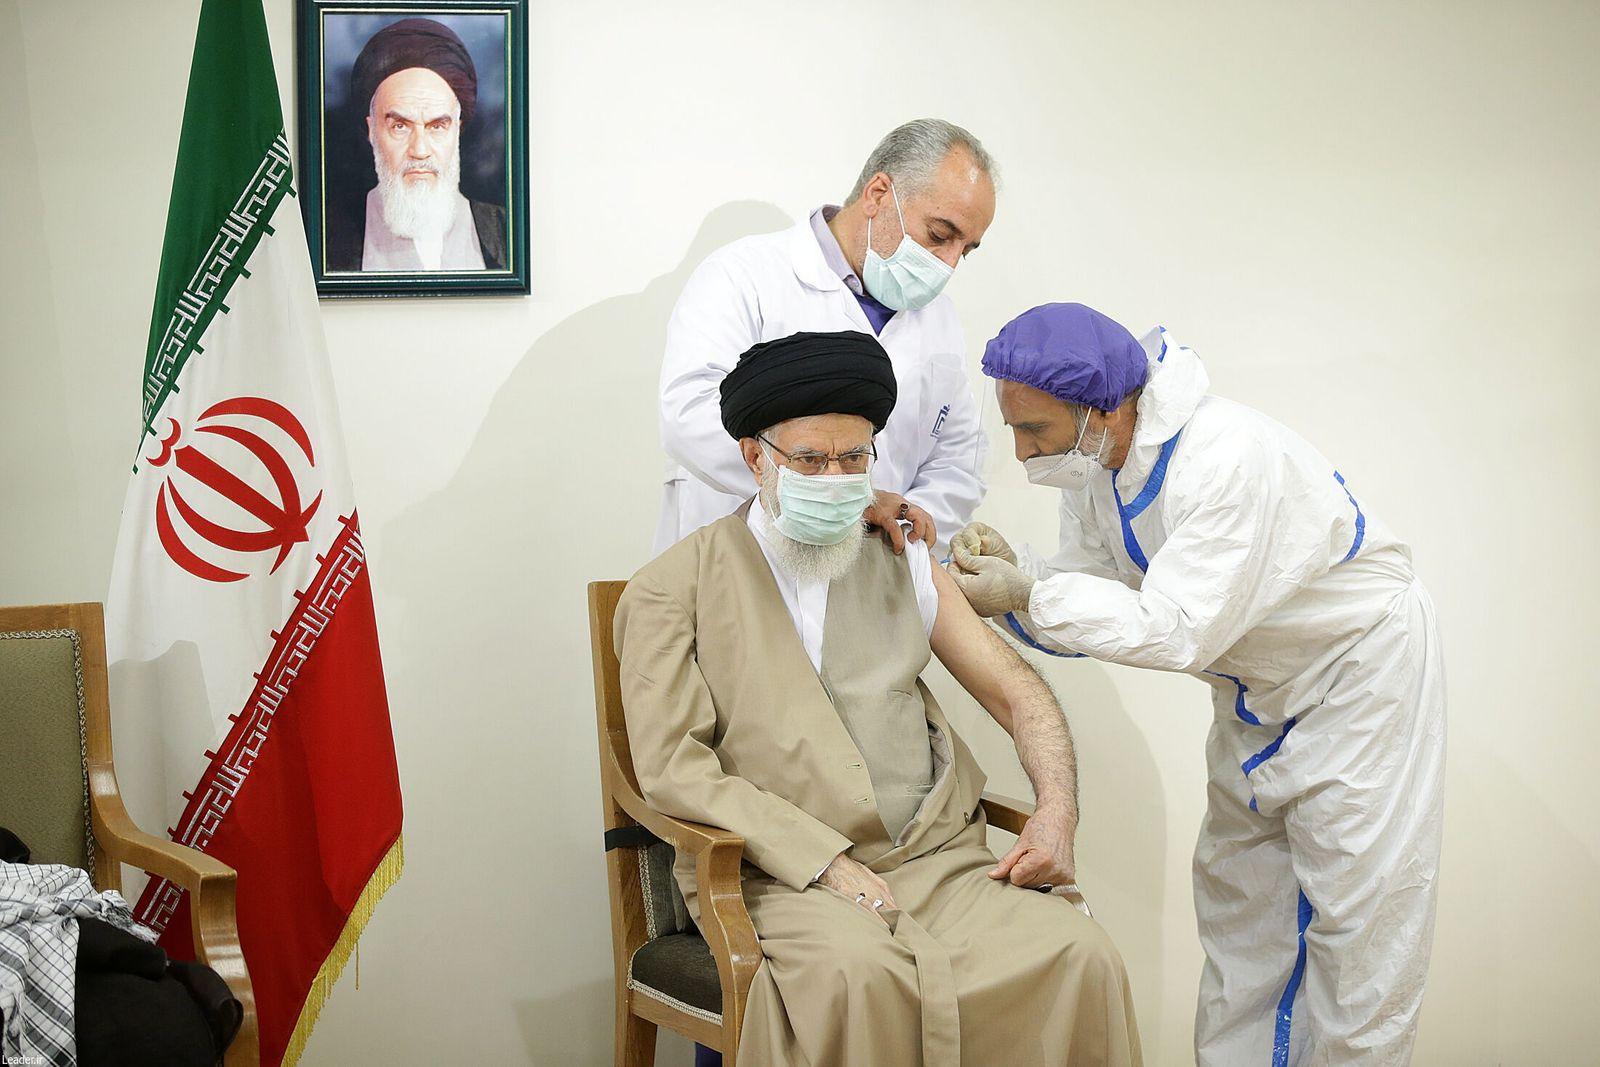 Iranian supreme leader receives locally-made COVID-19 vaccine